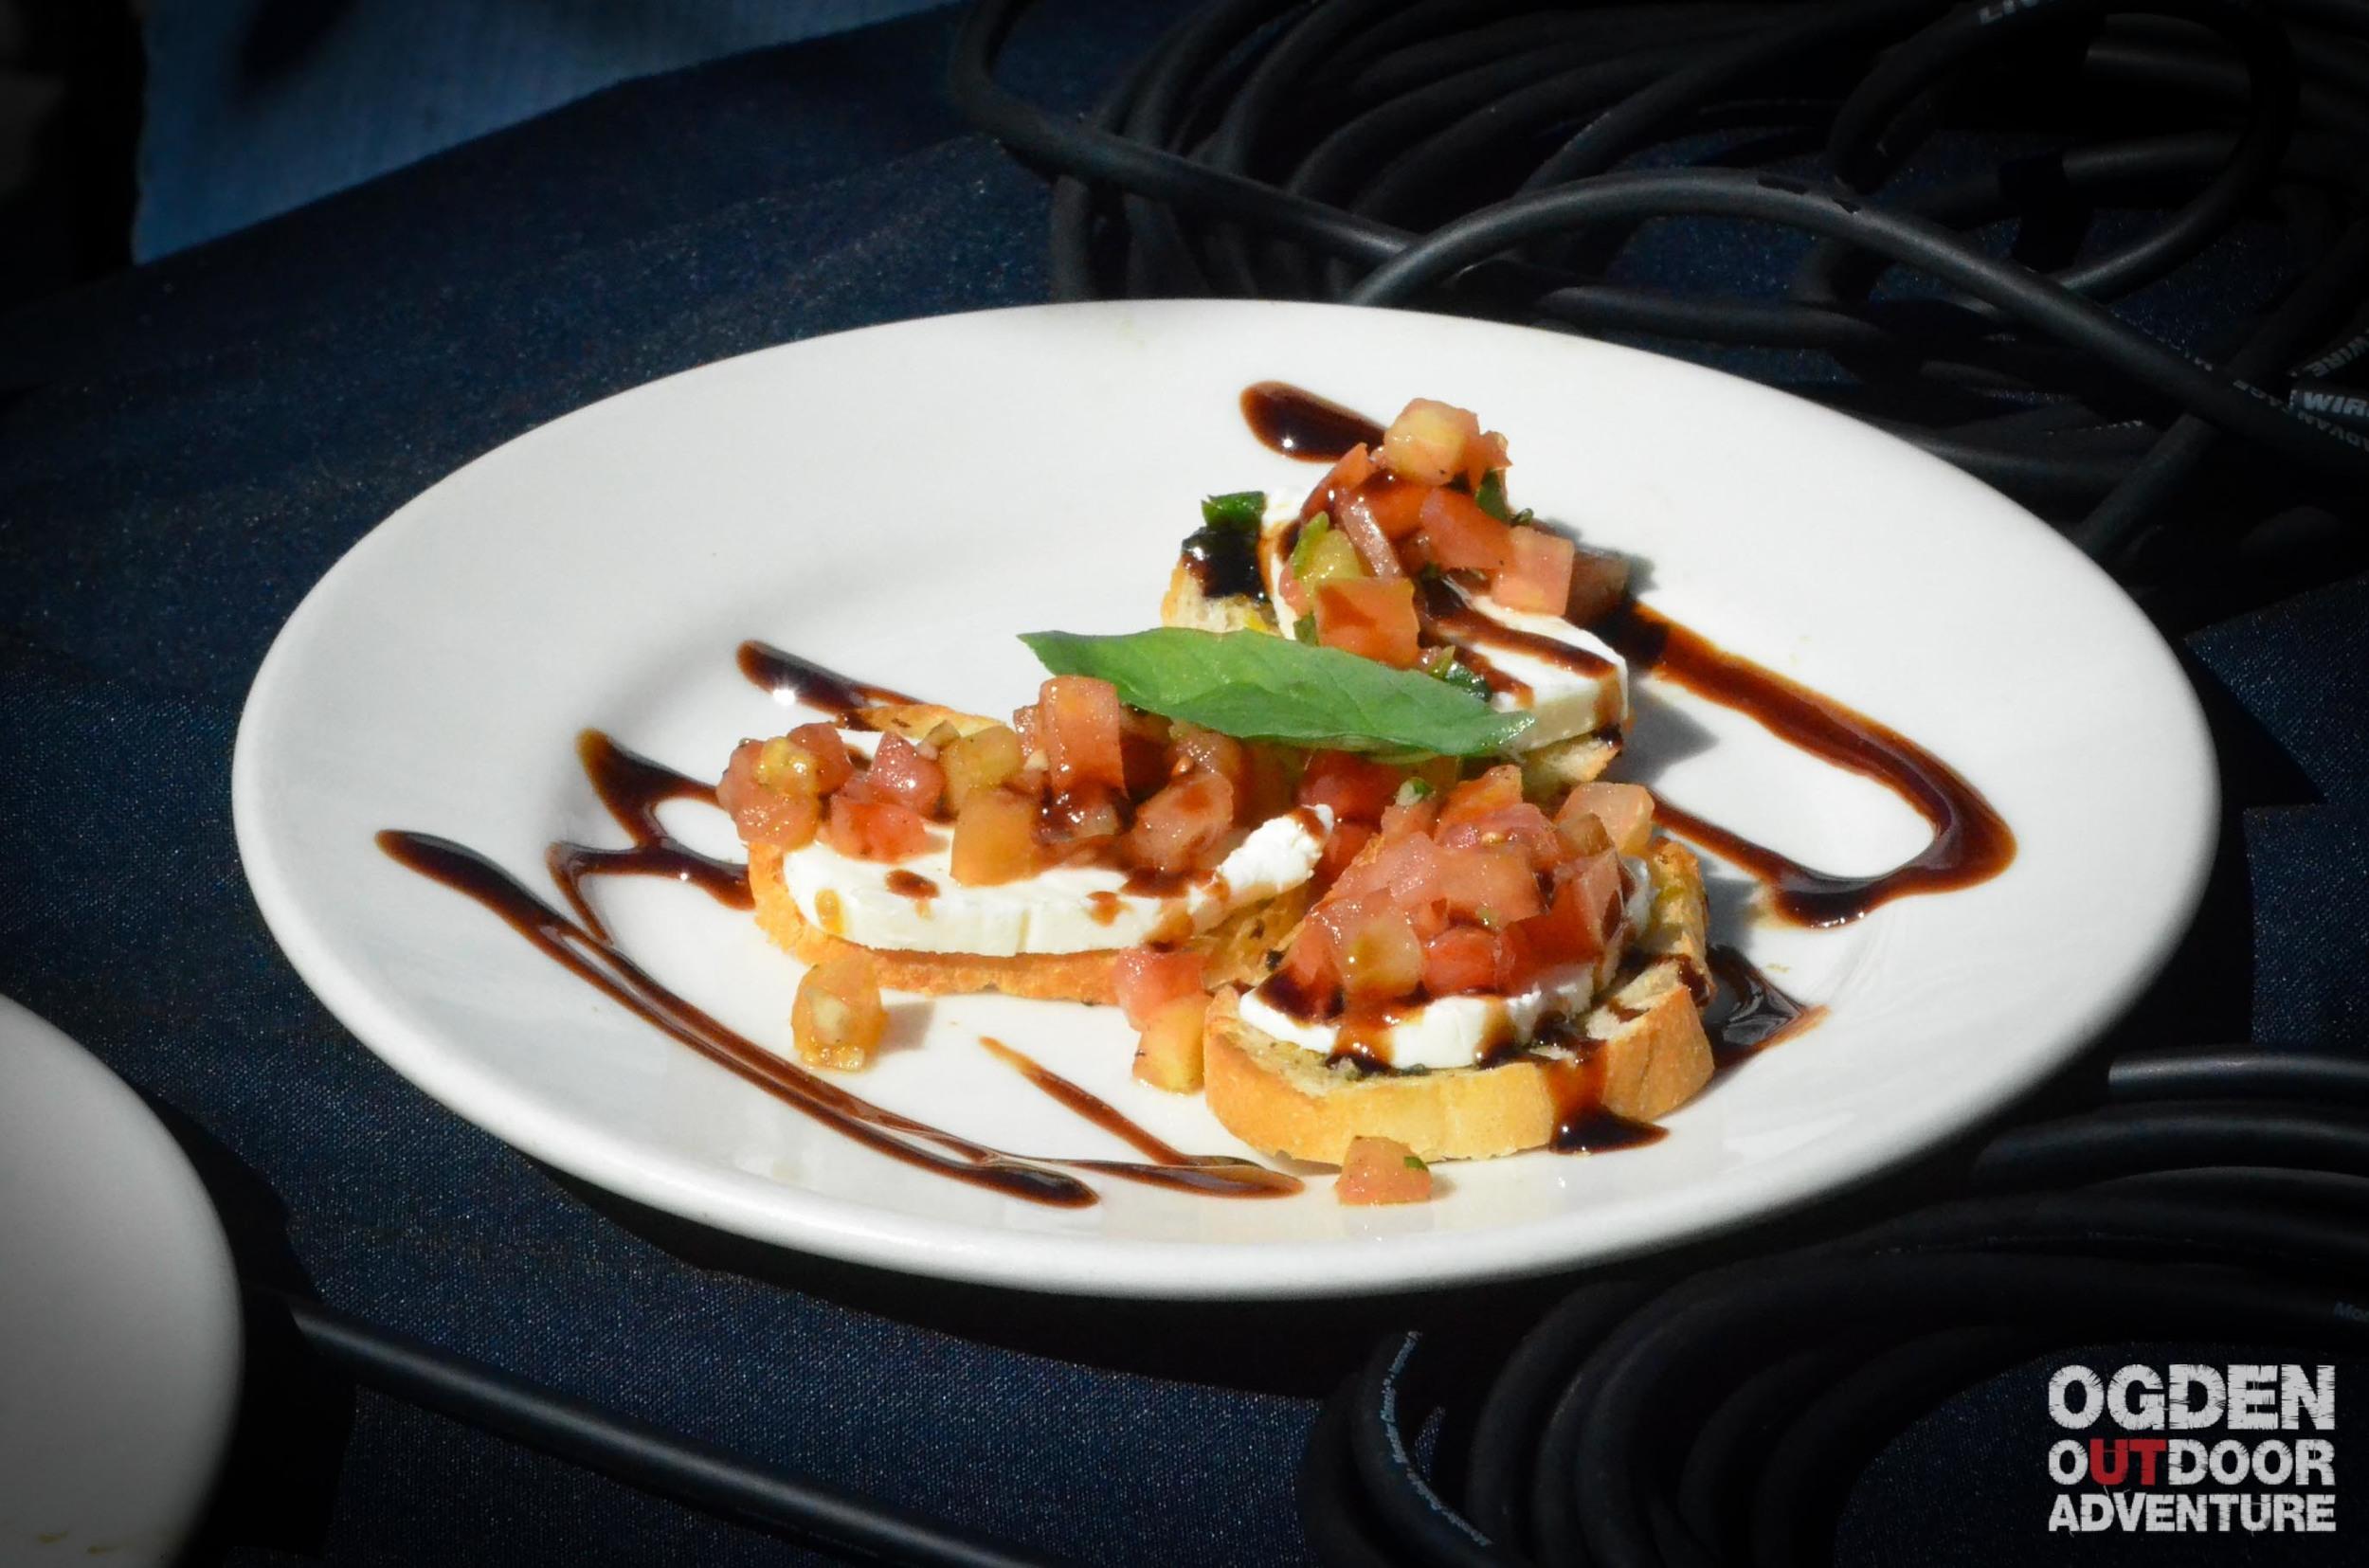 Ogden Restaurant Week-1.jpg